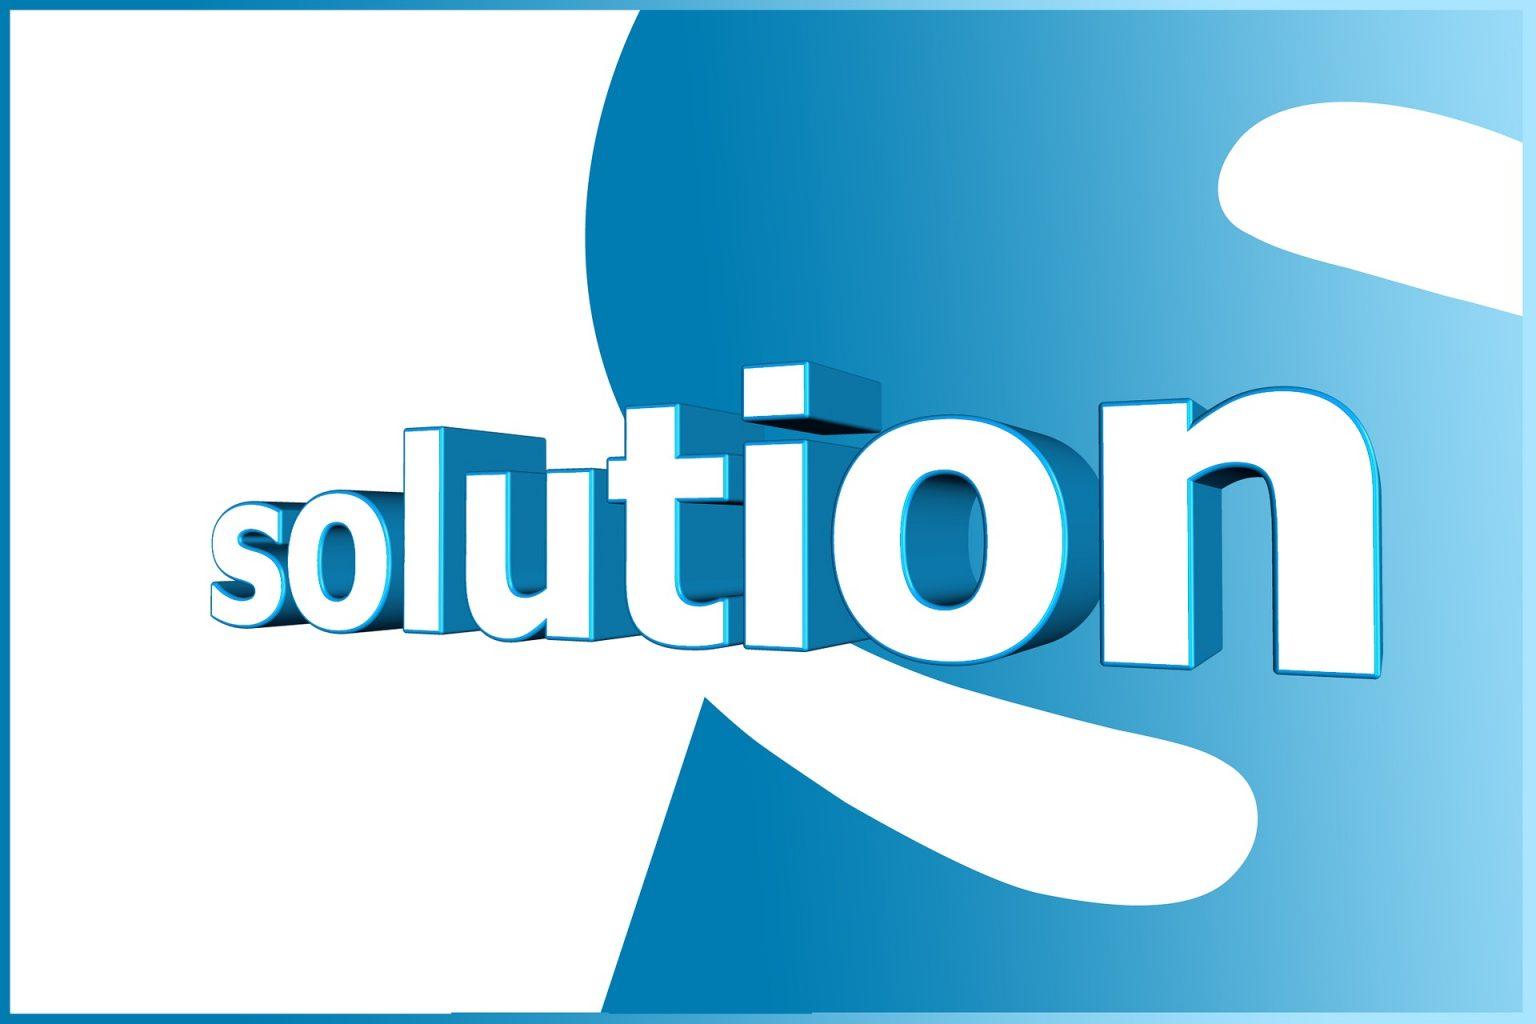 solution-2113700_1920-1536x1024